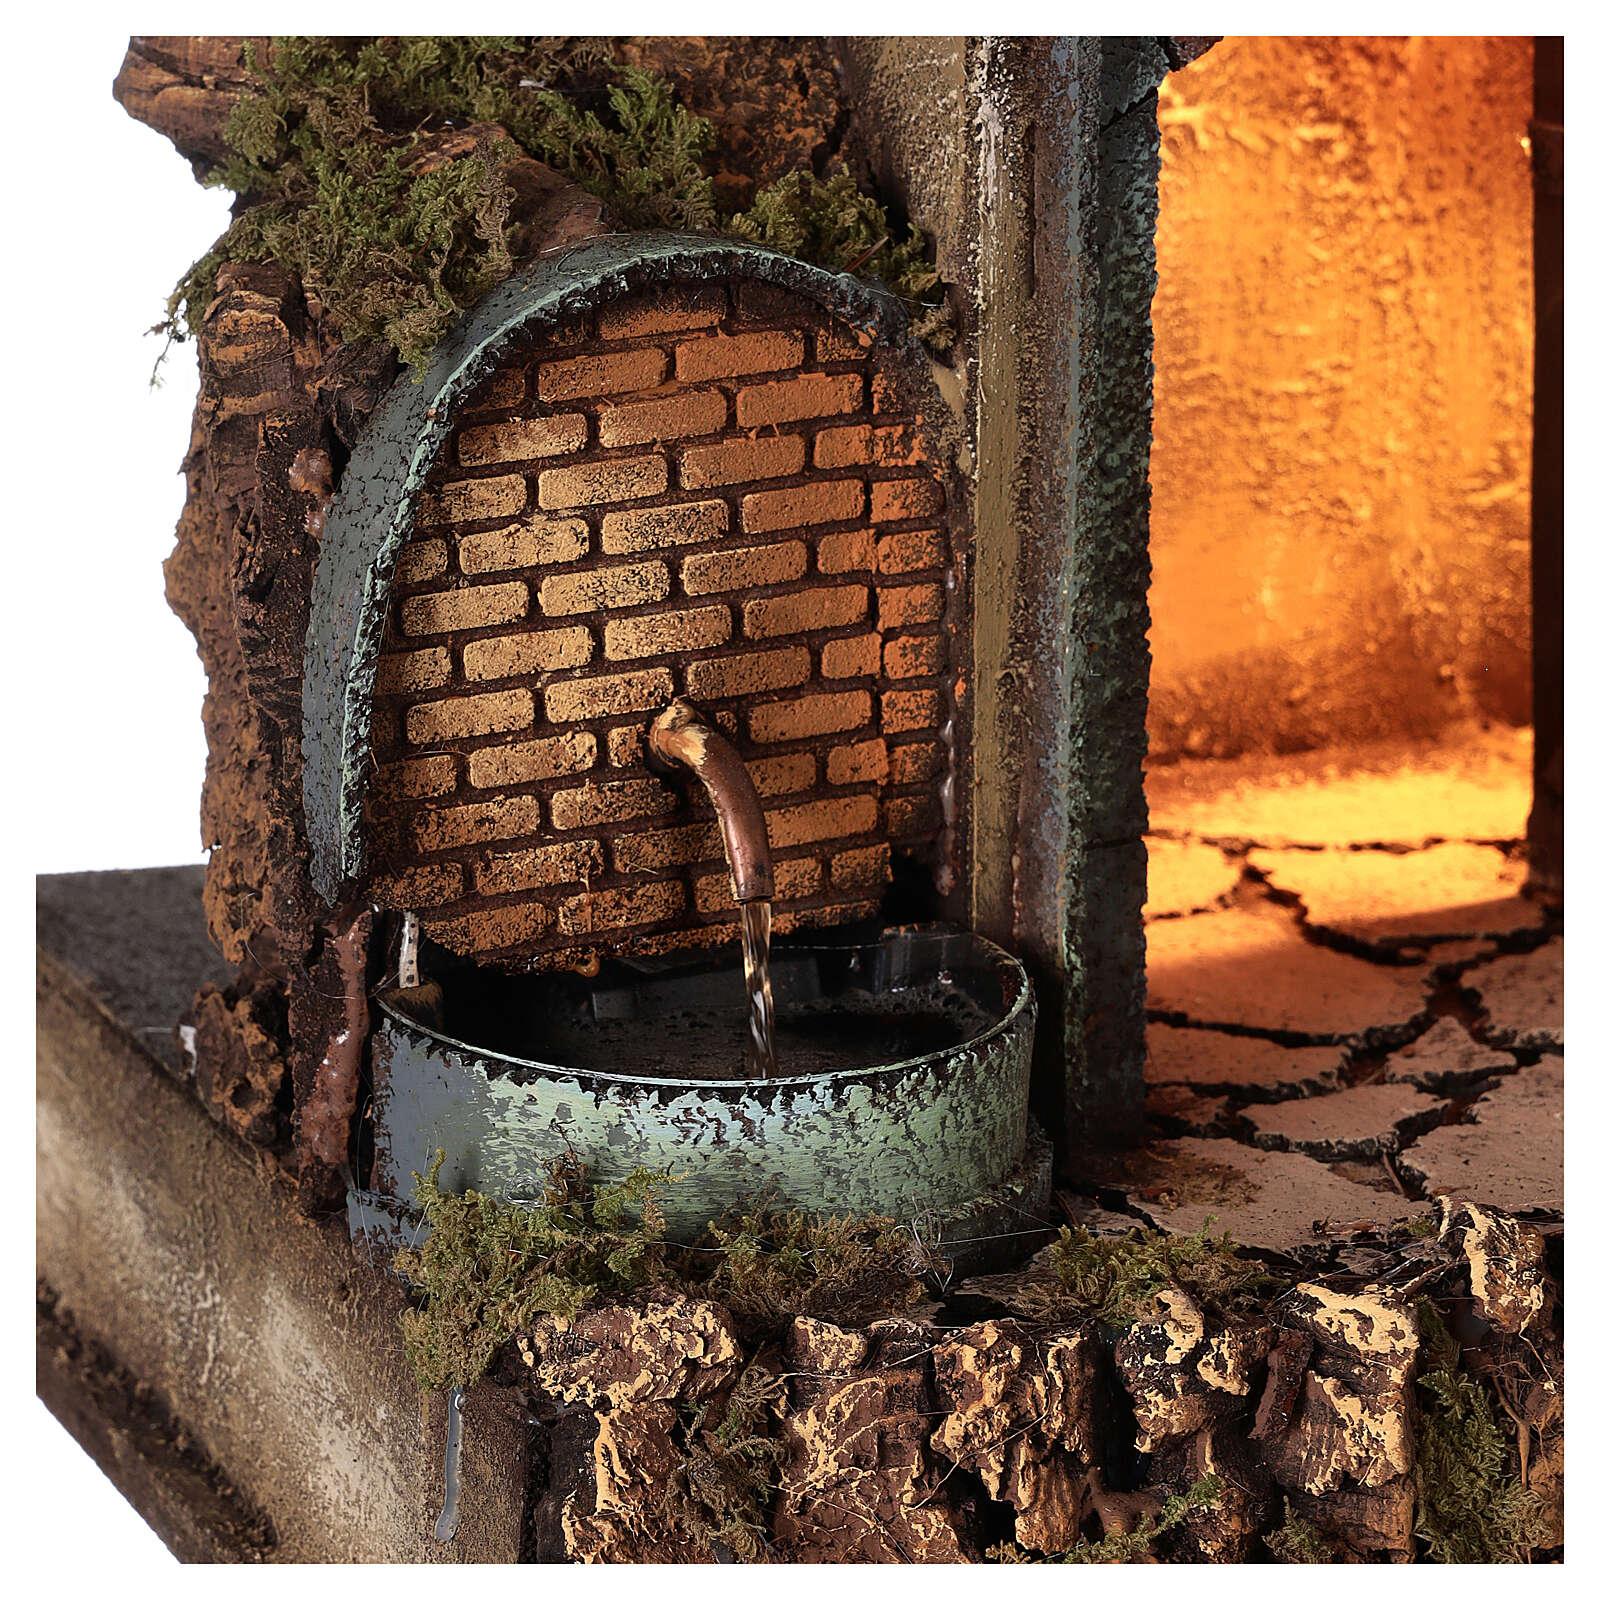 Neapolitan Nativity Scene village illuminated porches fountain 60x50x40 cm for figurines of 10-12 cm average height 4